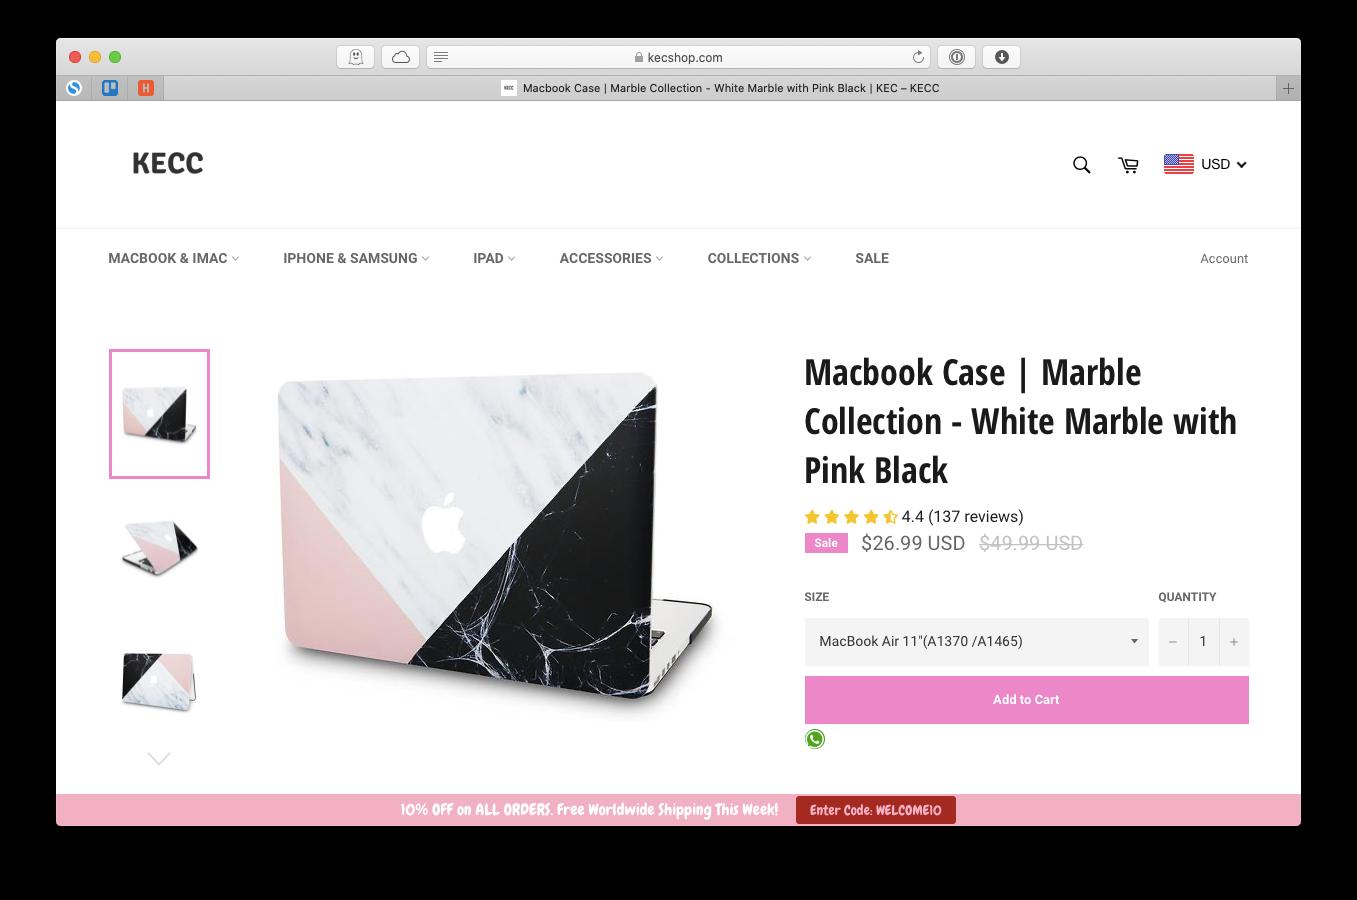 KECC marble MacBook case